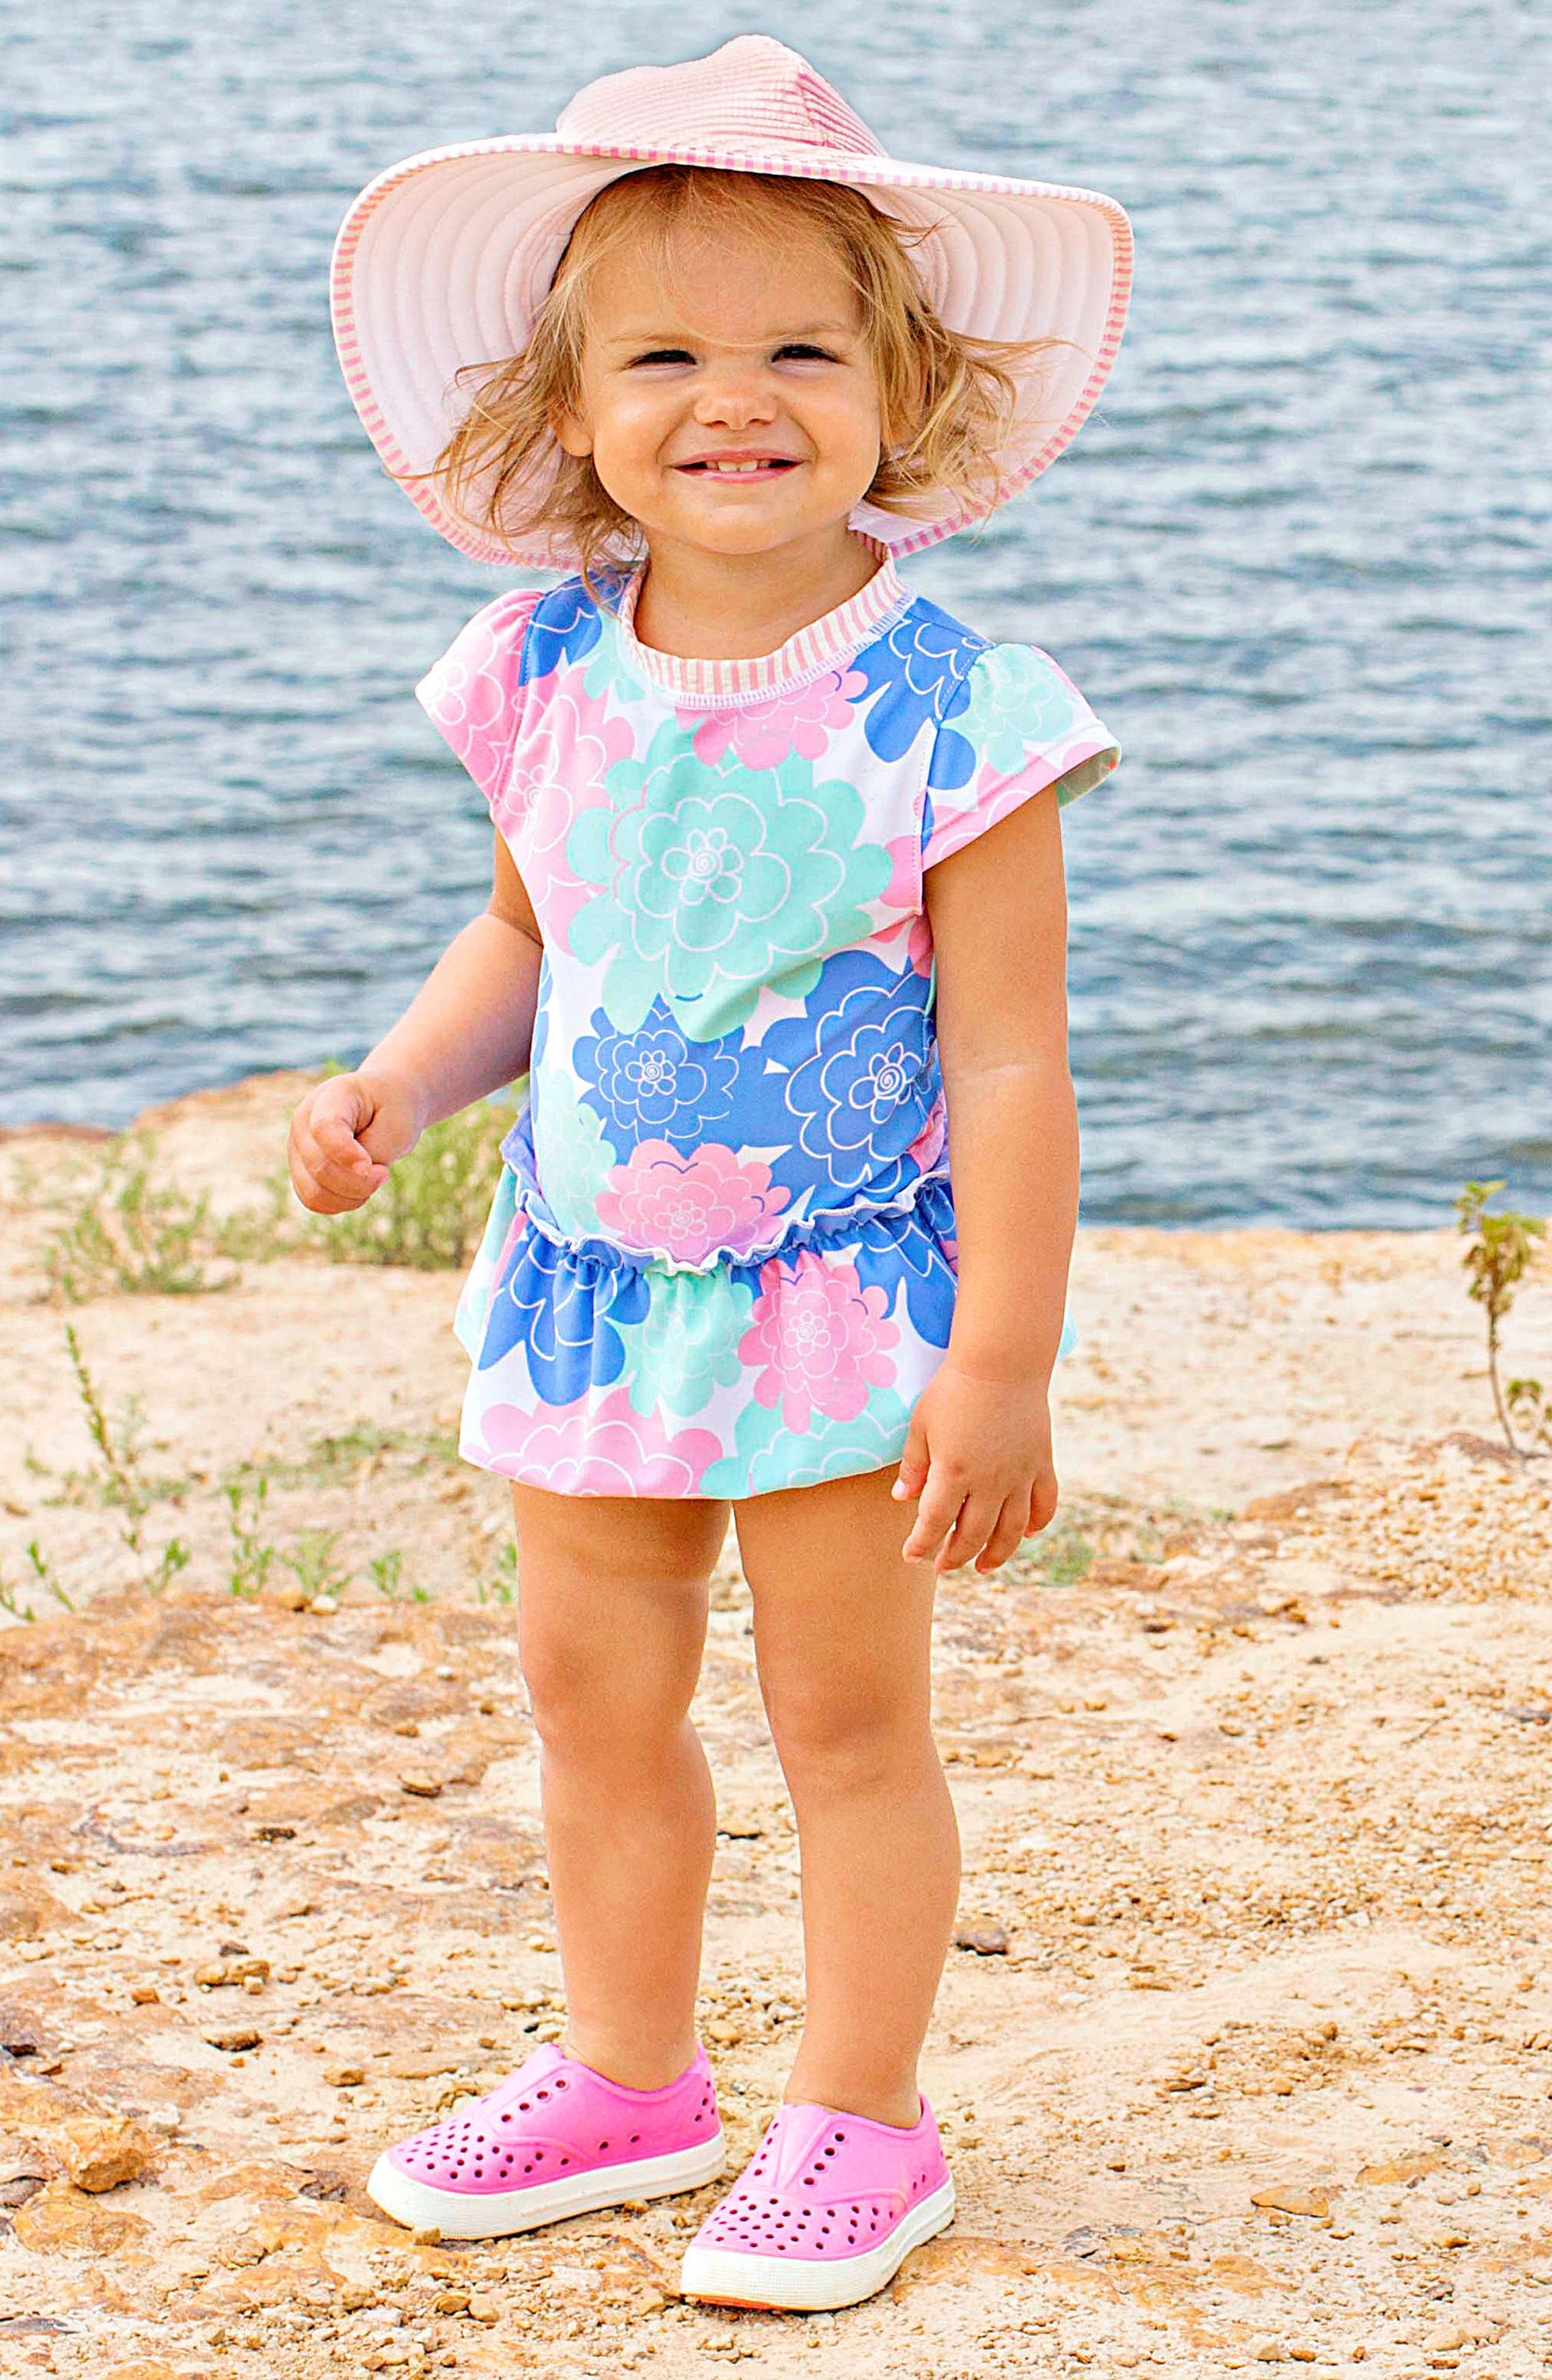 Alternate Image 3  - Ruffle Butts Pastel Petals One-Piece Swimsuit & Hat Set (Baby Girls)